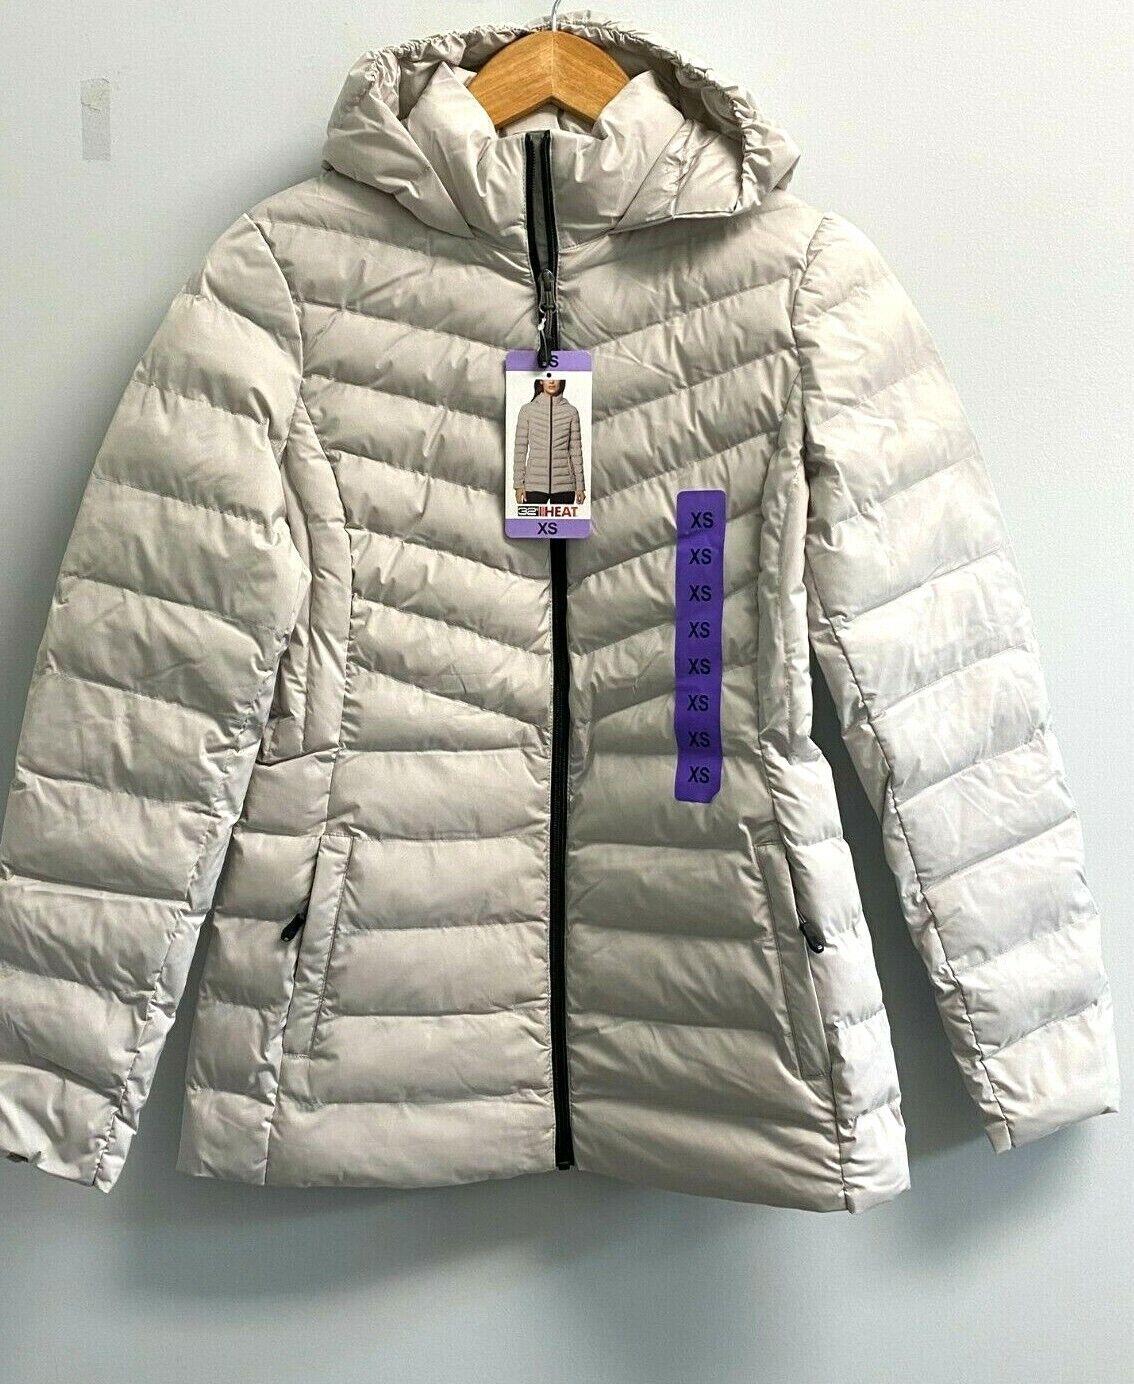 NEW 32 Degrees Heat Women's S,M,L,XXL Hooded 2-Way Stretch Jacket Silver Post